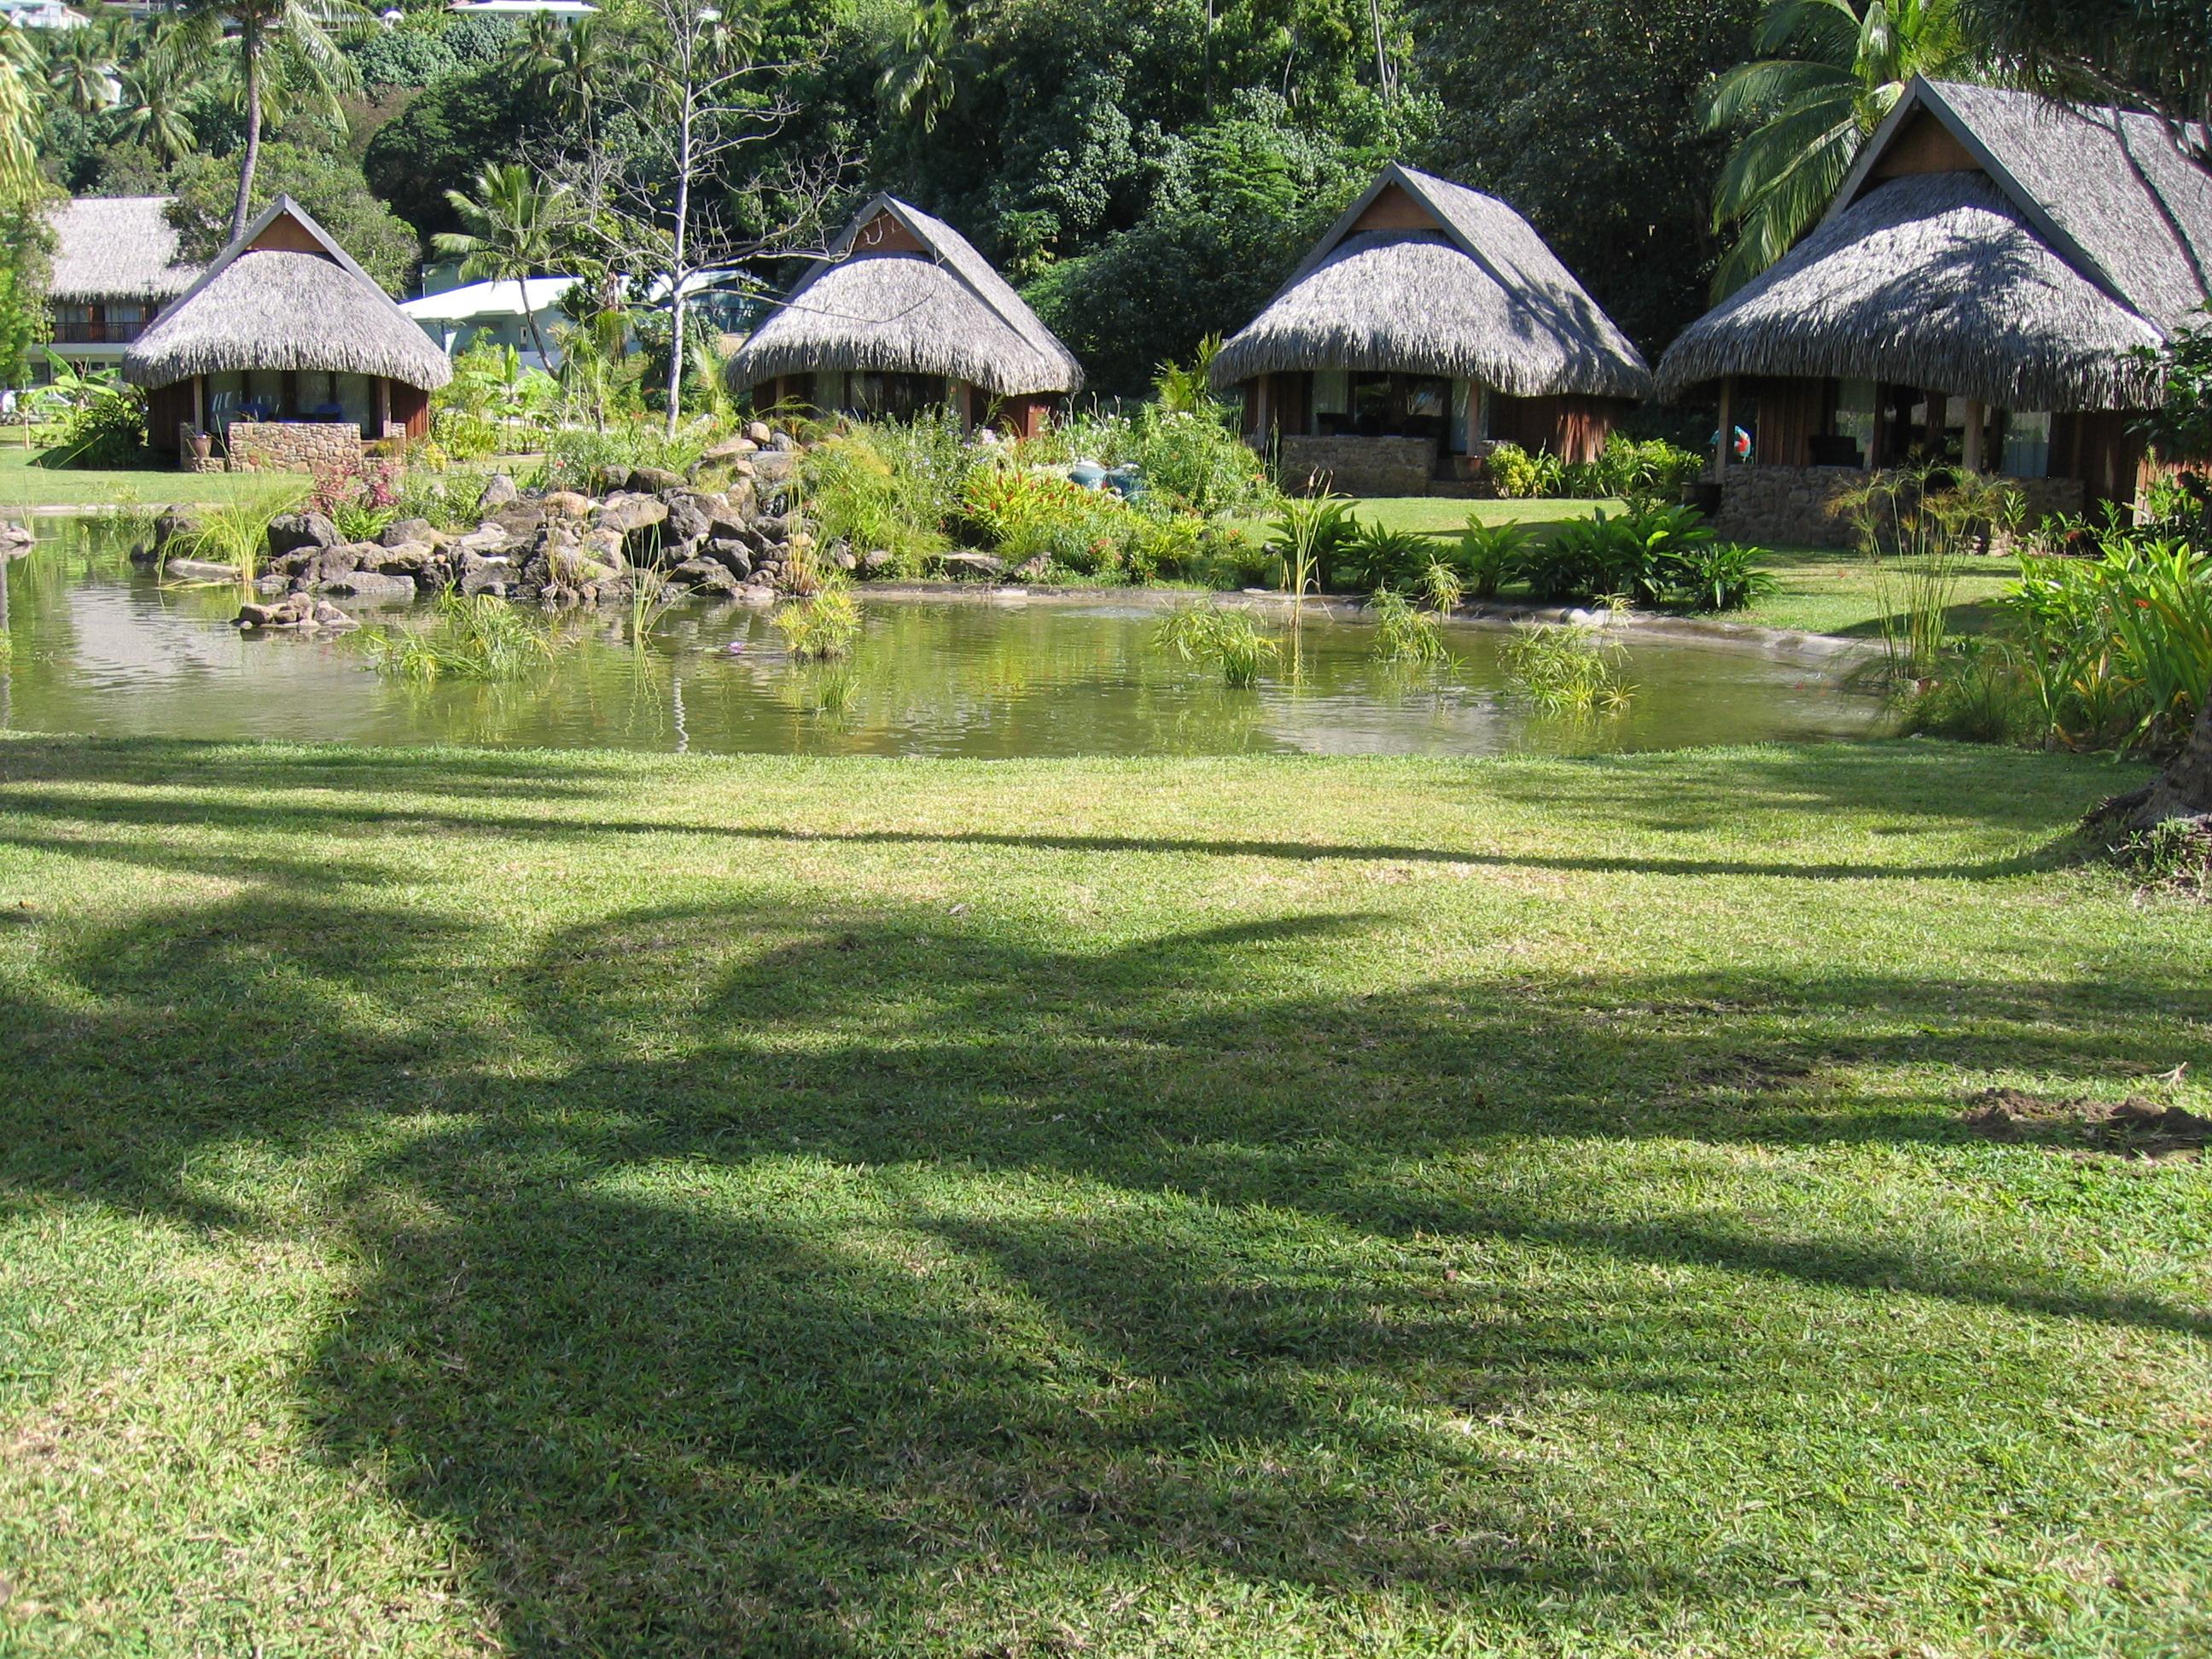 https://tahititourisme.com/wp-content/uploads/2017/11/MOZ-Sofitel-Moorea-Deluxe_Garden_Bungalows_photo-by-Angelique-2007.jpg